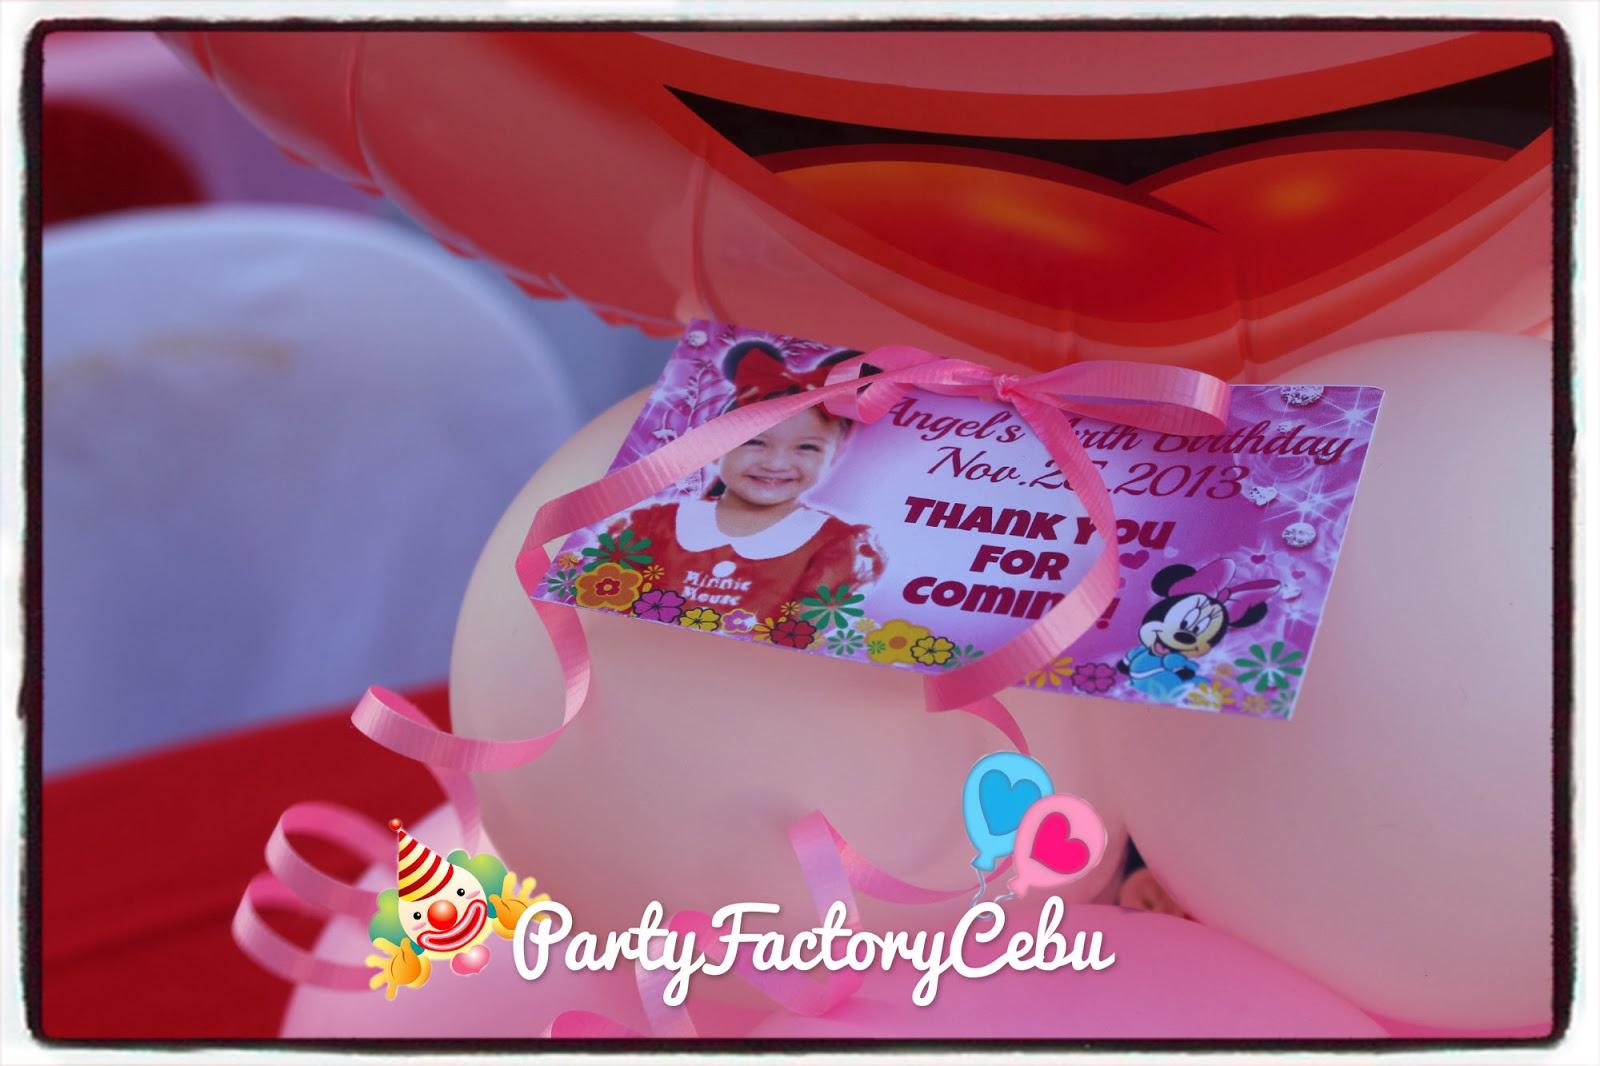 Welcome To Partyfactory Cebu Angel S 4th Birthday Bash